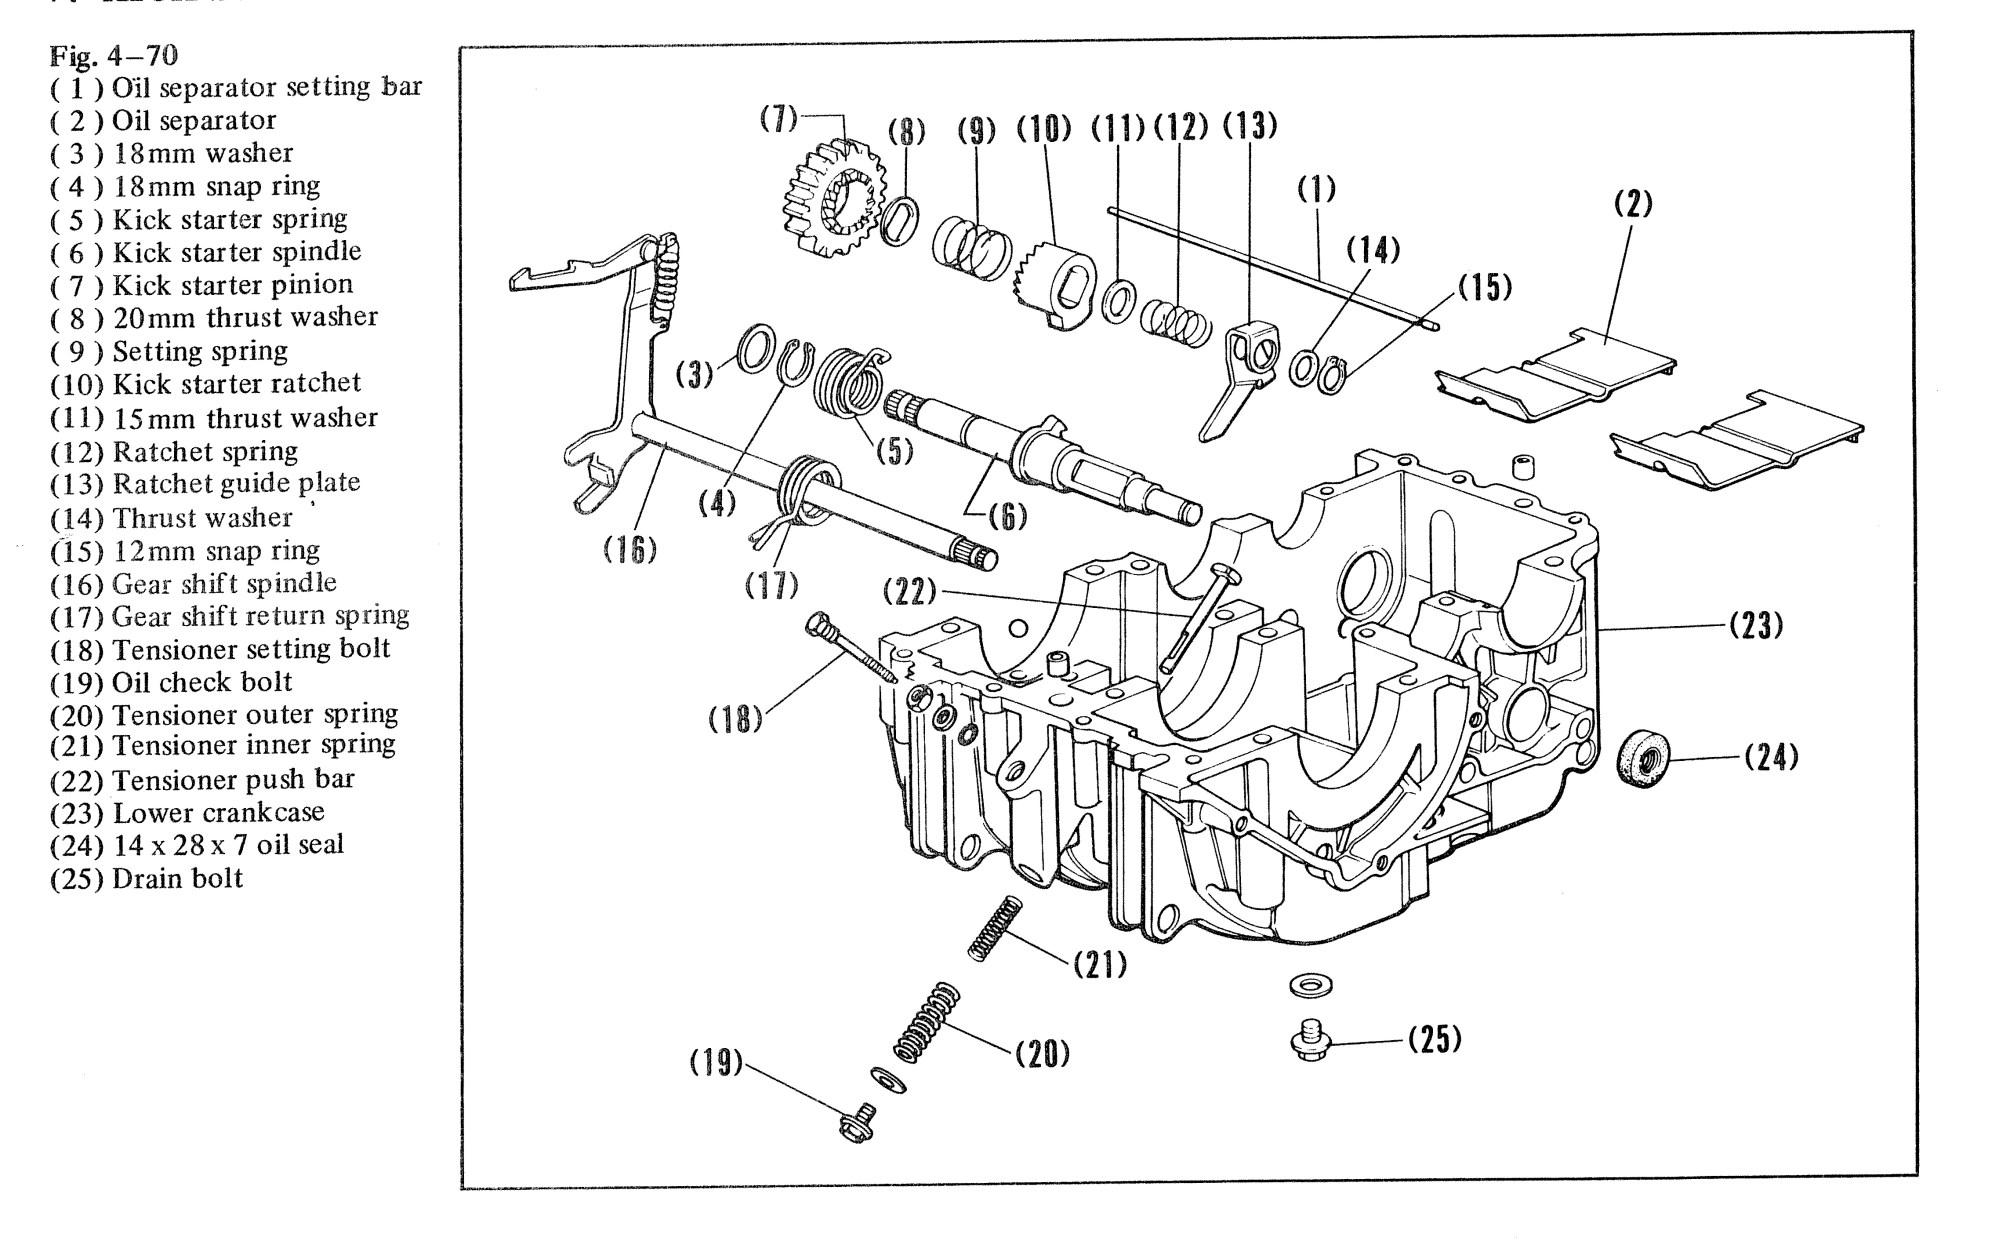 hight resolution of cb360 engine diagram wiring diagram query cb360 engine diagram